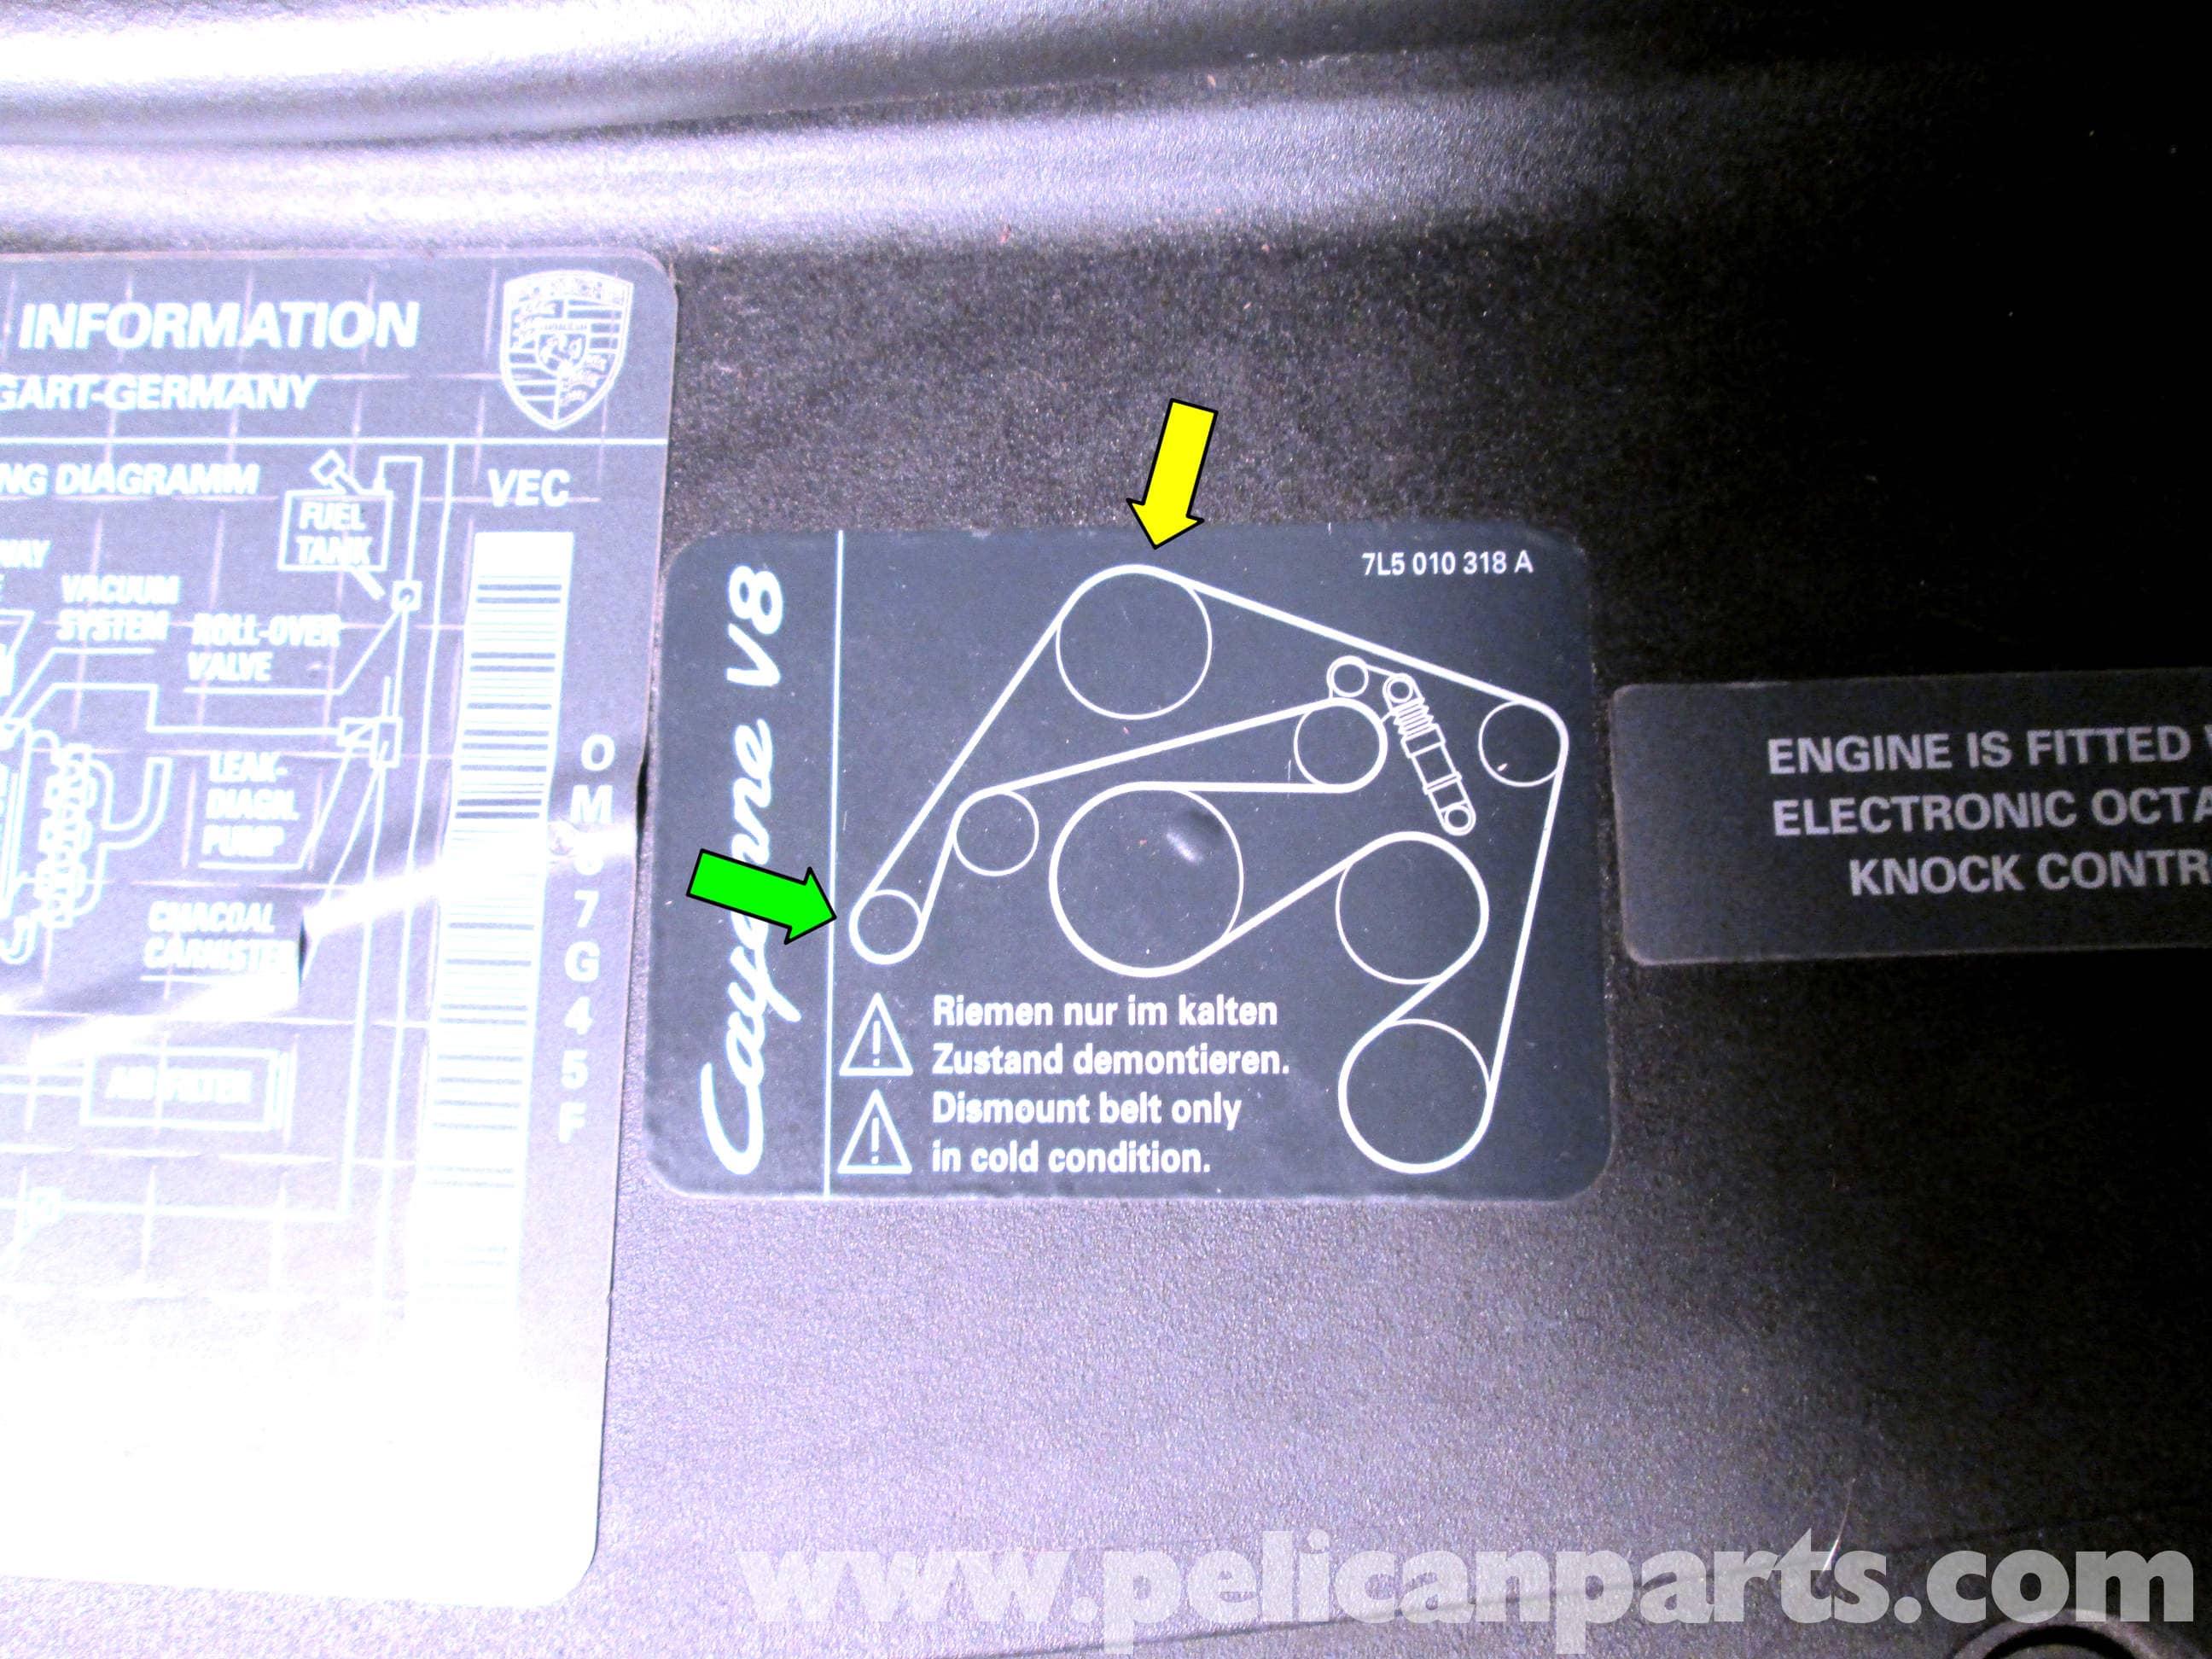 Porsche Cayenne Serpentine Belt Replacement 2003 2008 Pelican Engine Diagram Large Image